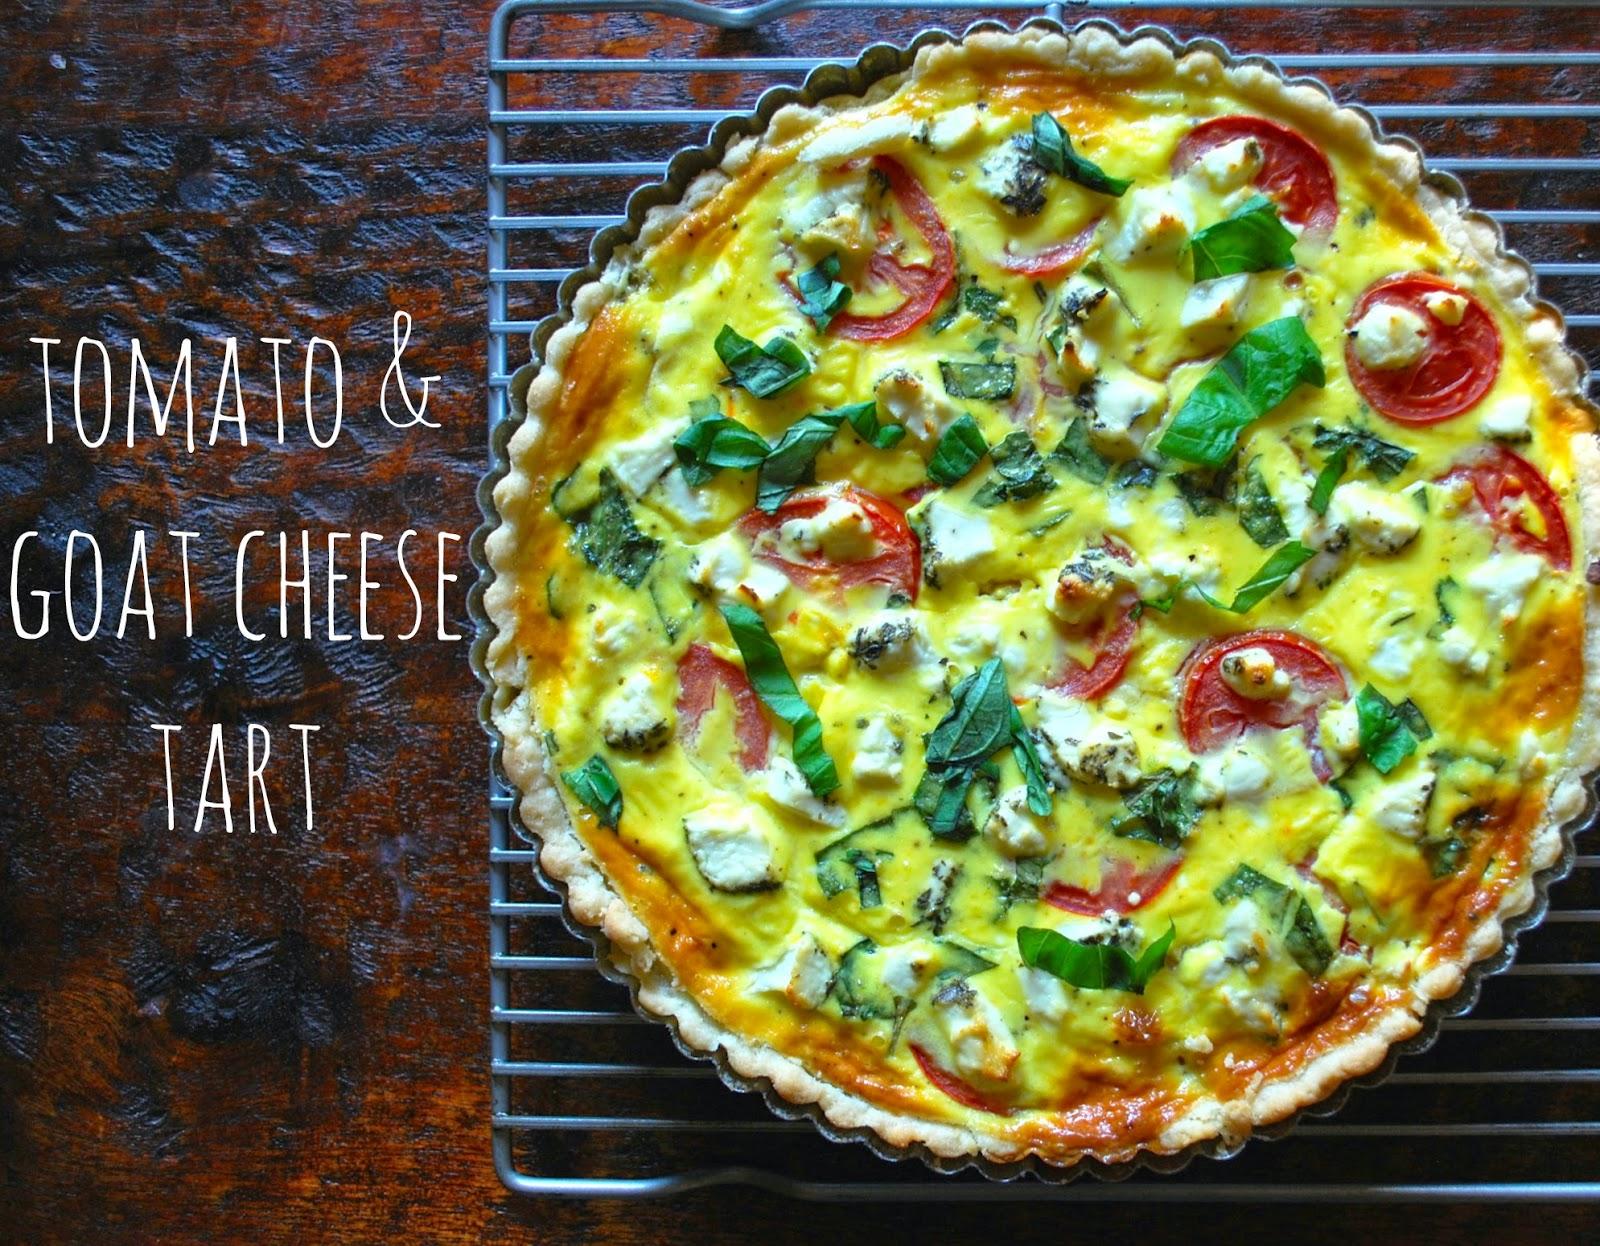 Tomato & Goat Cheese Tart | Bevy Richmond